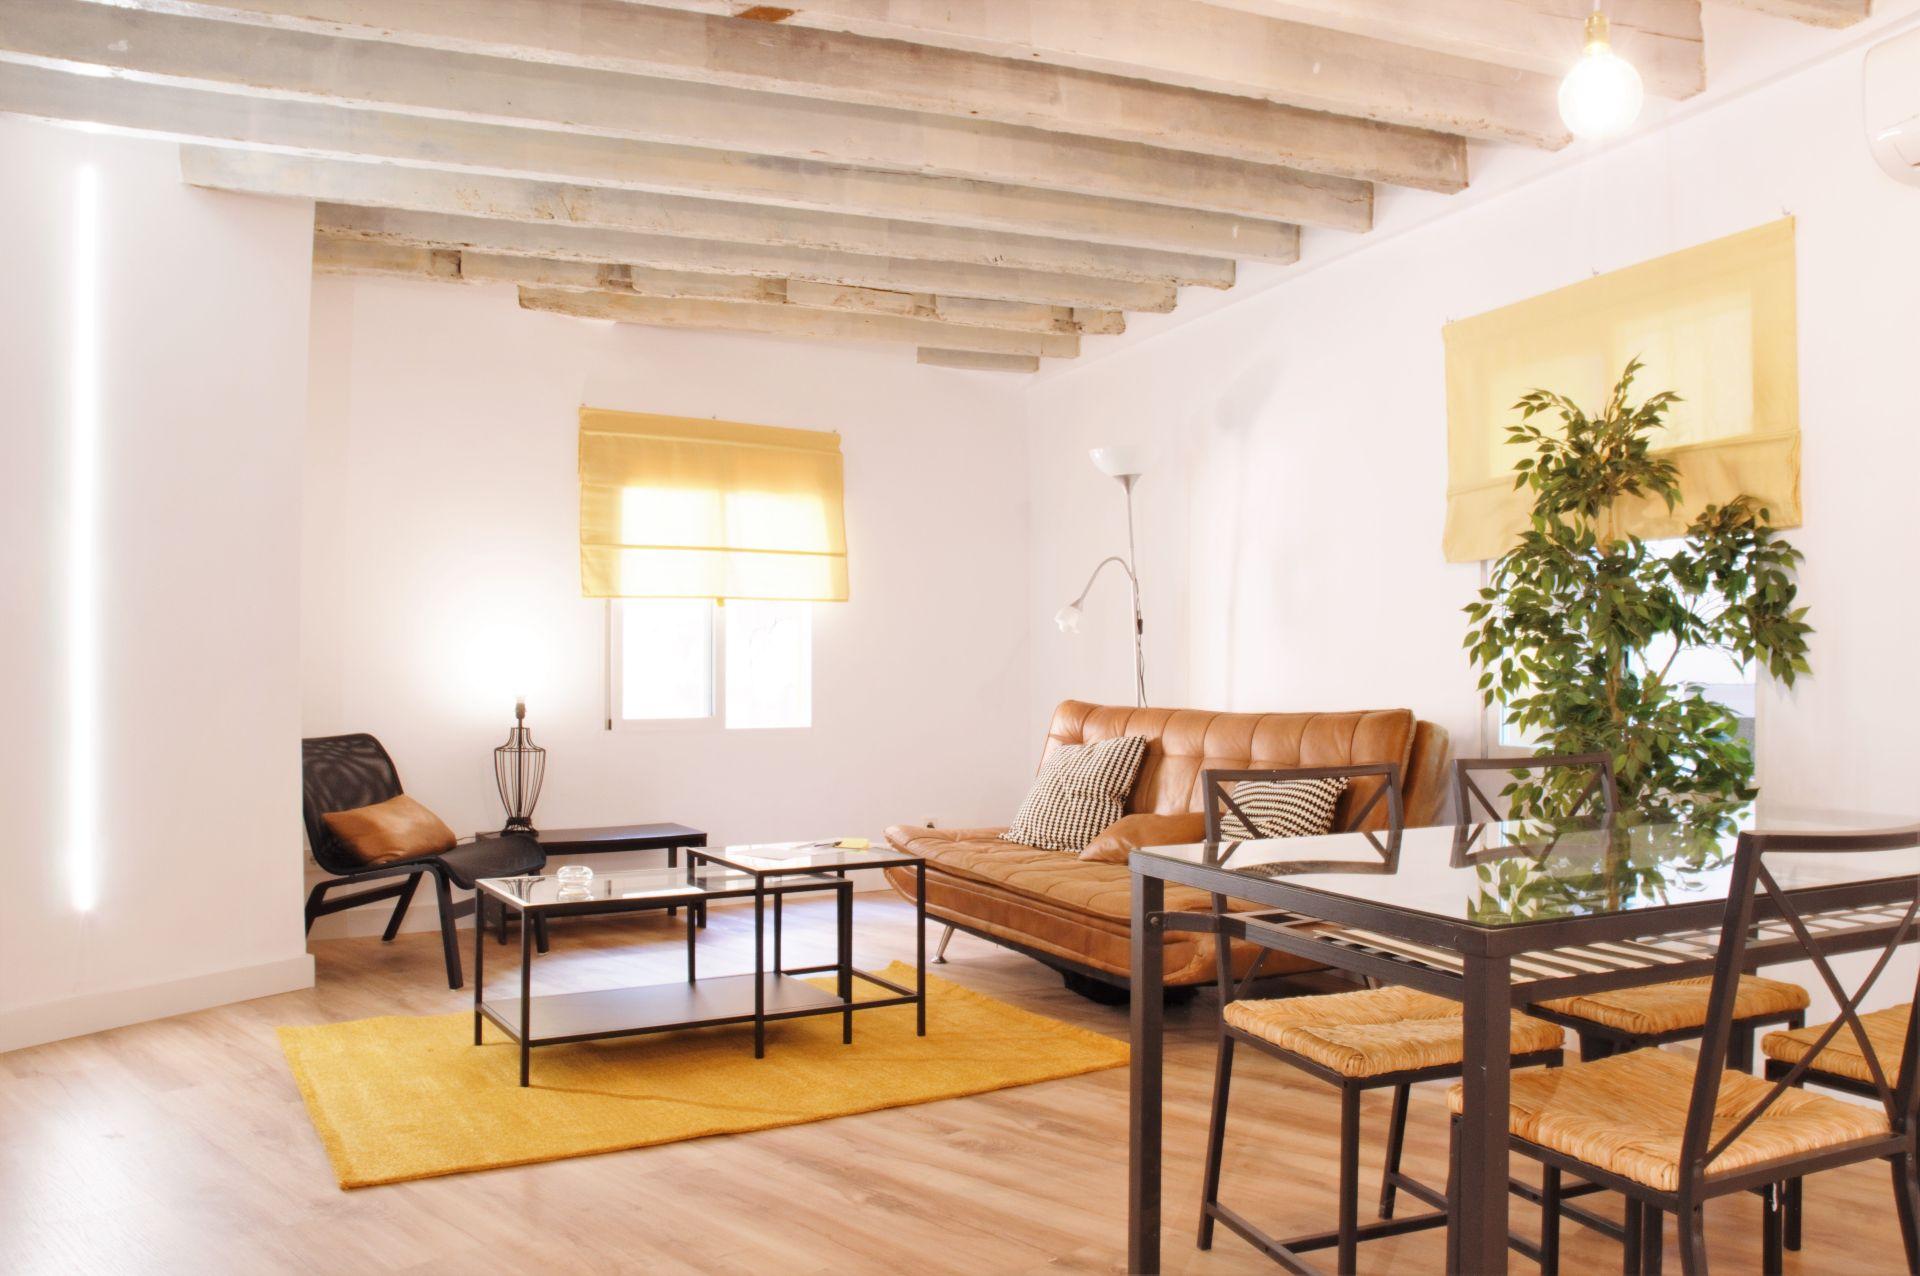 Wohnung in Palma, Paseo Borne - Plaza Mercat, miete